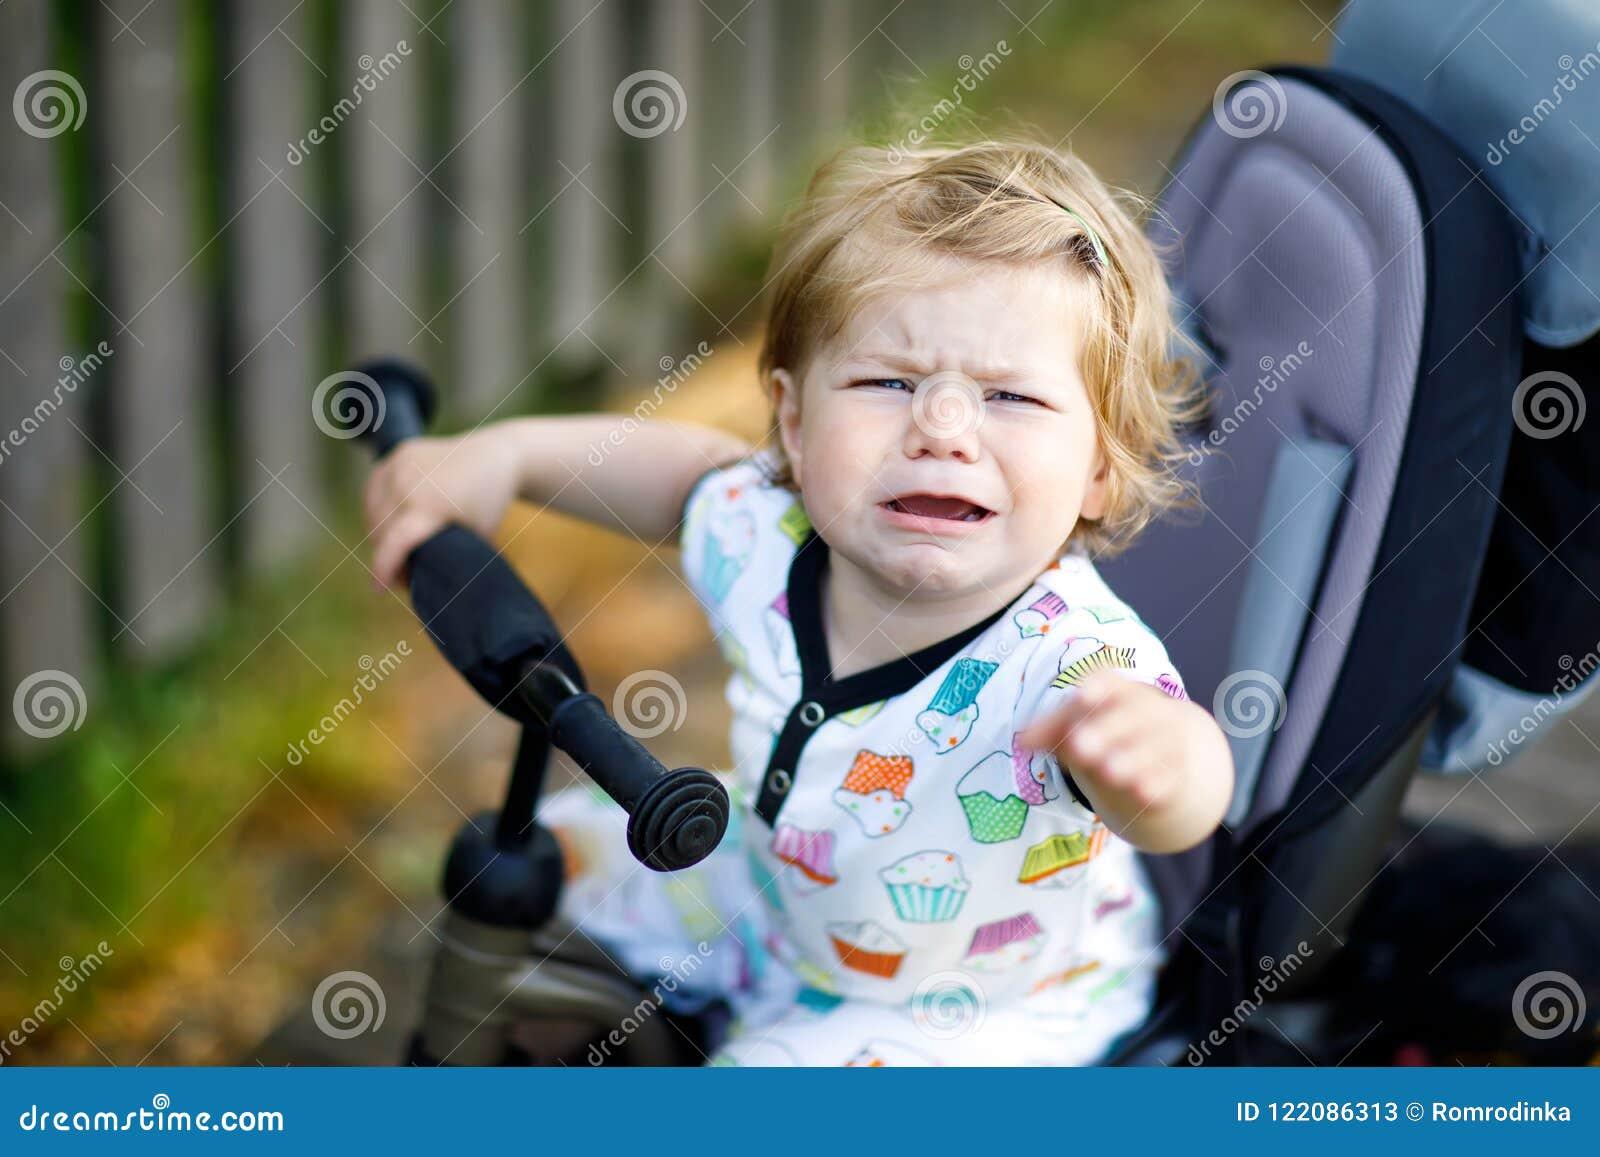 f56e9c67b Cute Adorable Crying Sad Toddler Girl Sitting On Pushing Bicyle Or ...